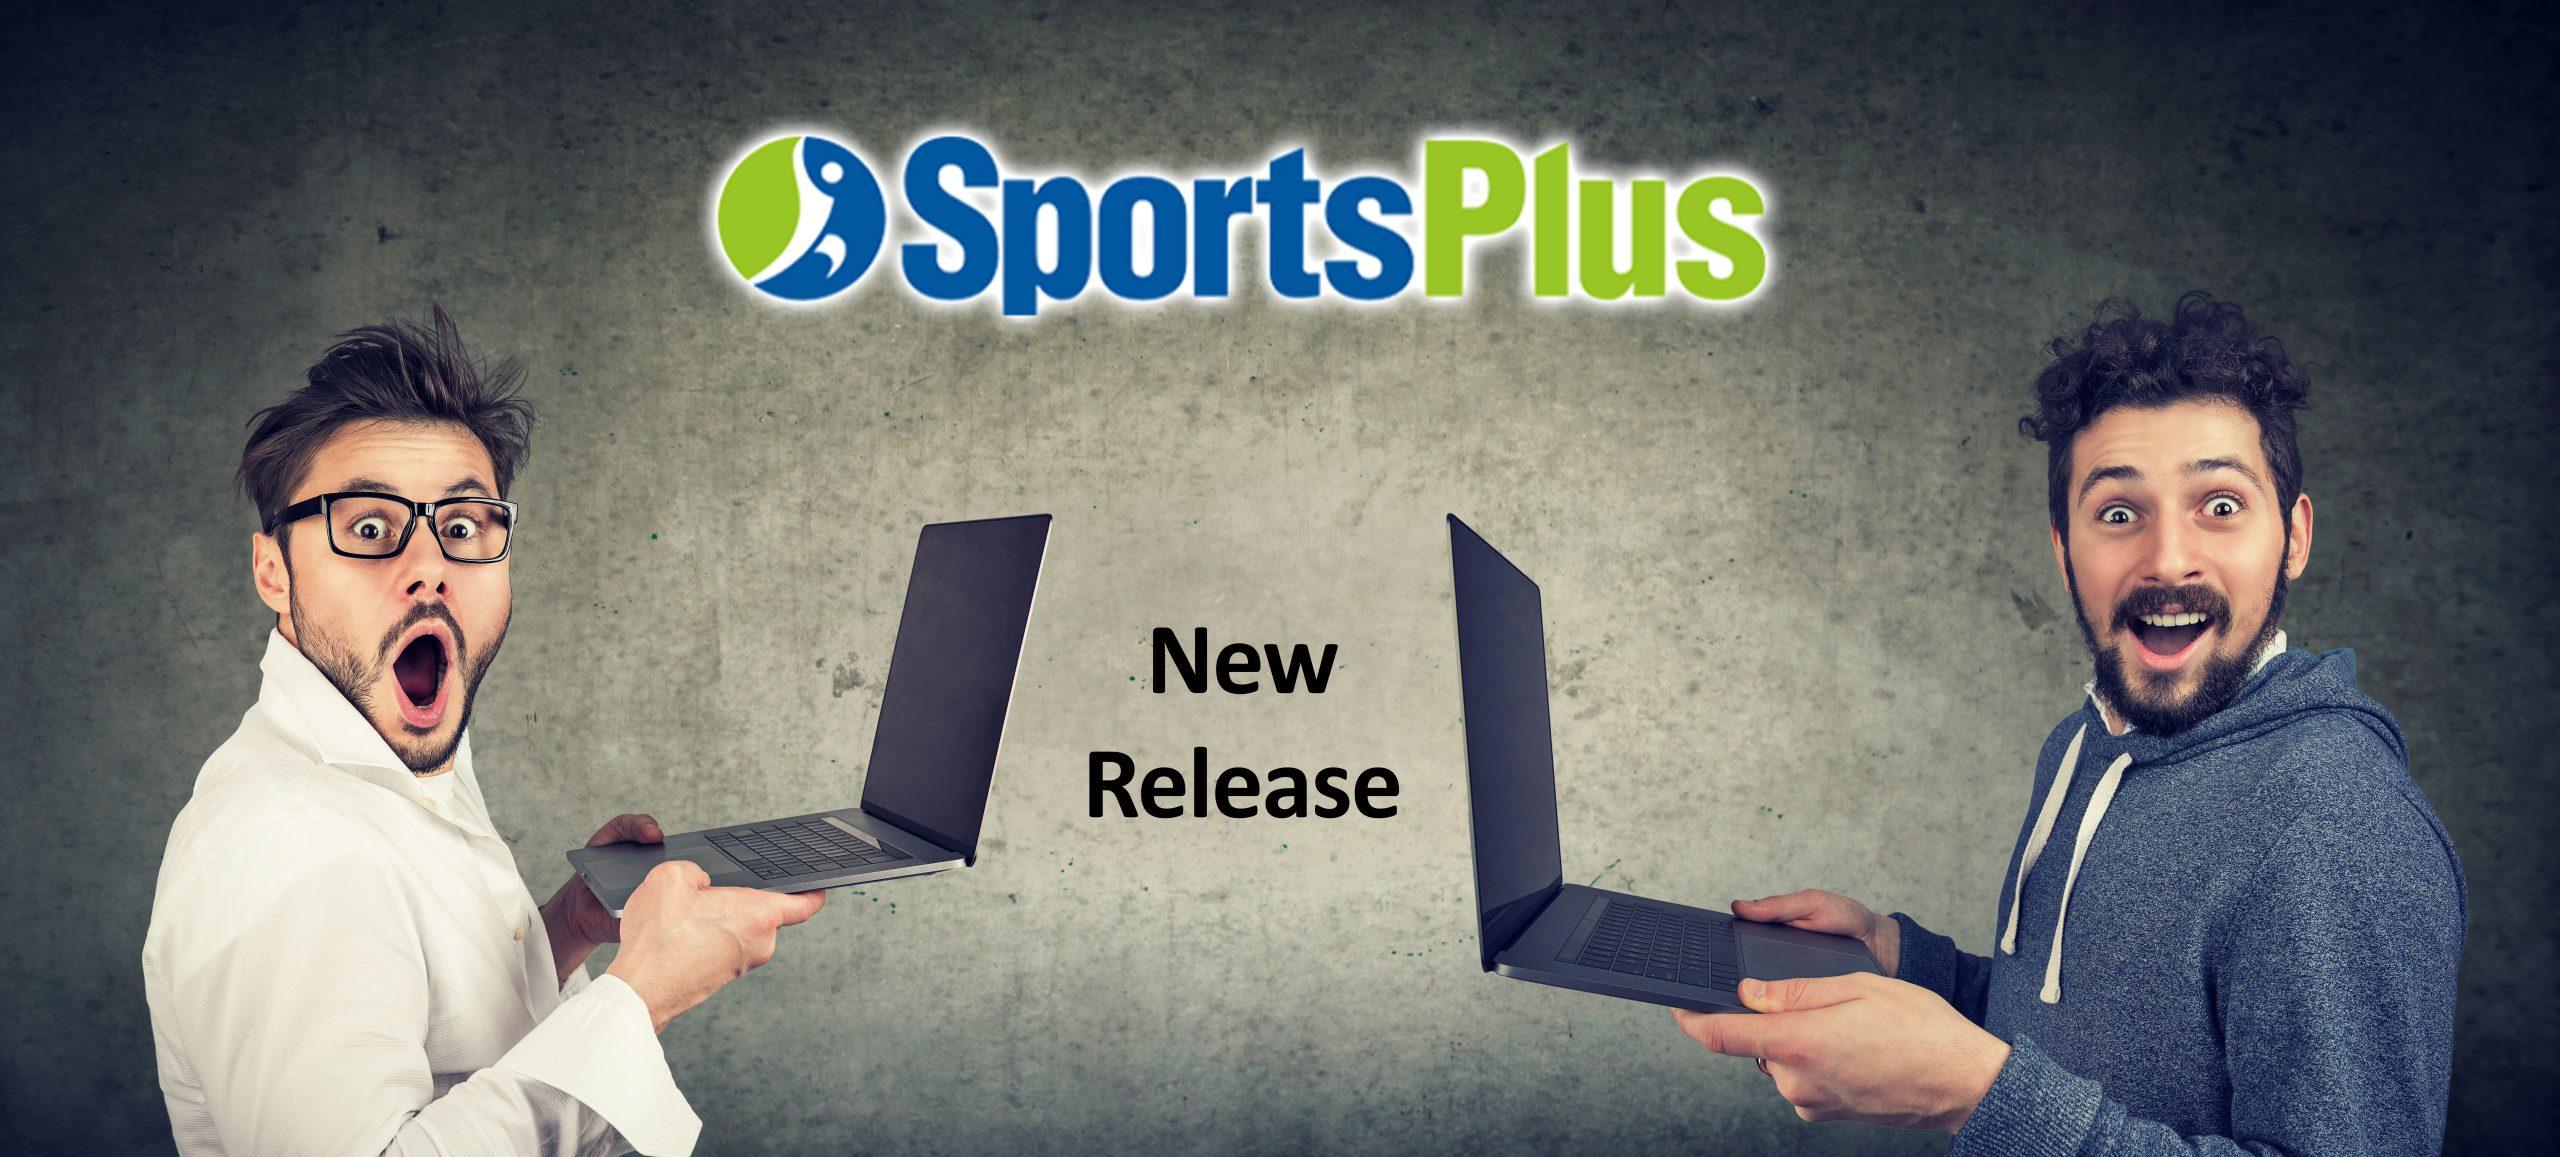 sportsplus release notes